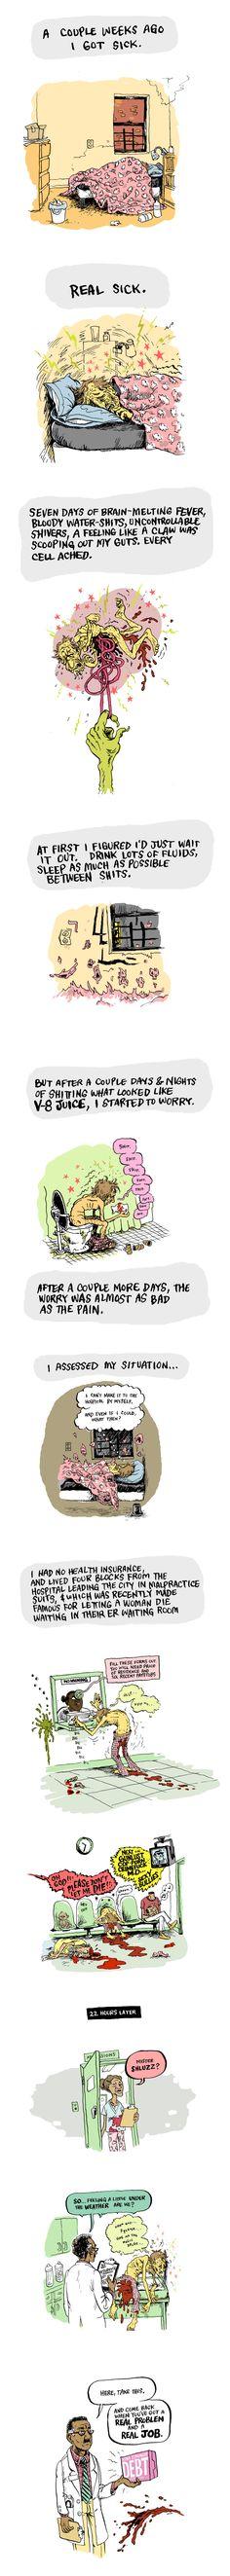 """Sick"" by Gabby Schulz, part 1"